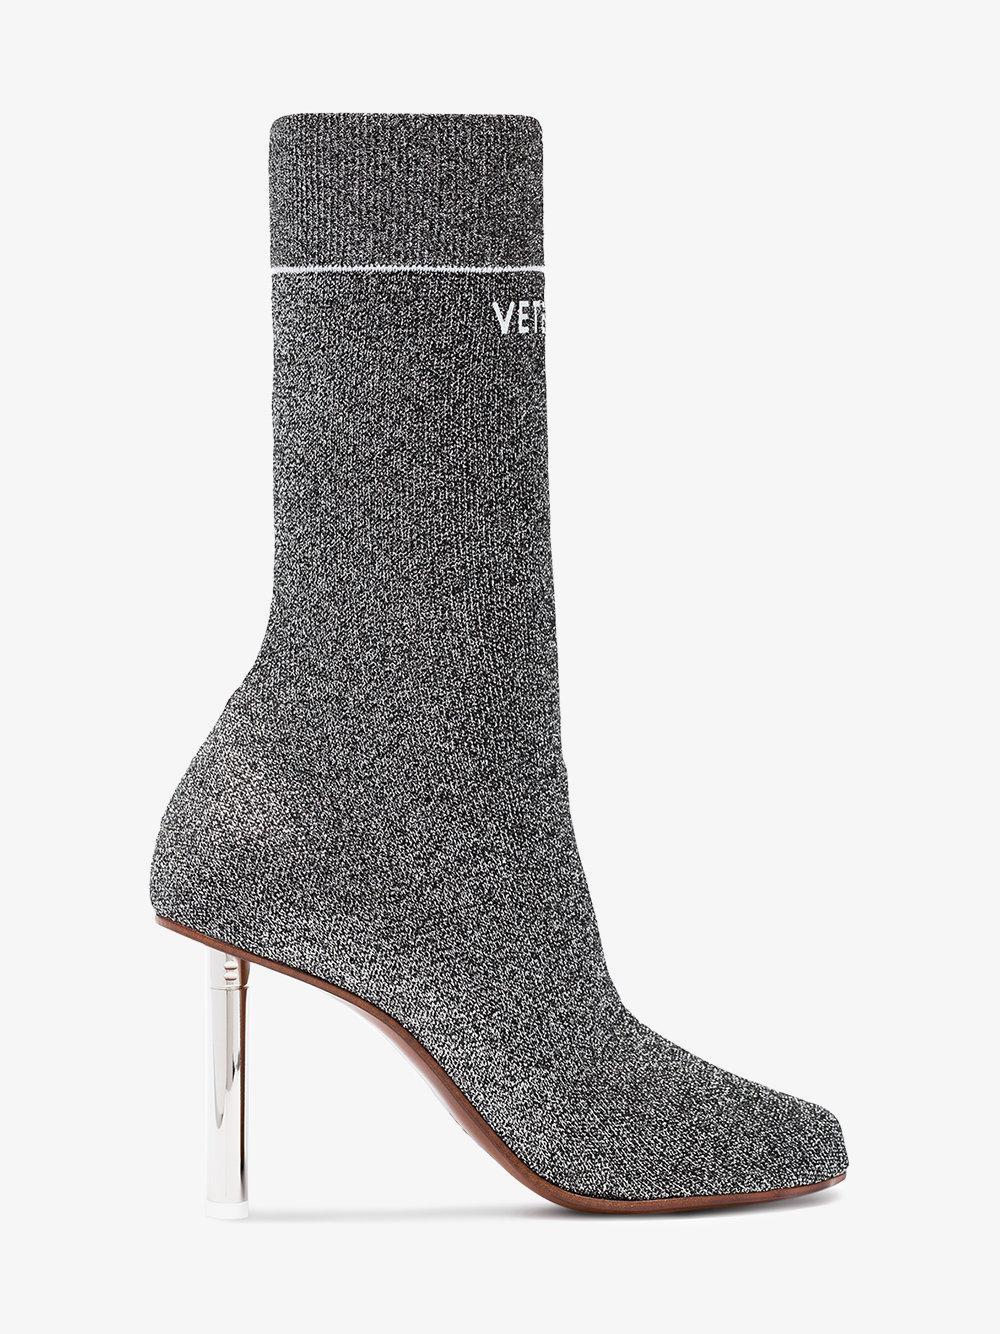 312c76b77f11d9 vetements-Metallic-Silver-100-Lurex-Light-Heel-Boots.jpeg